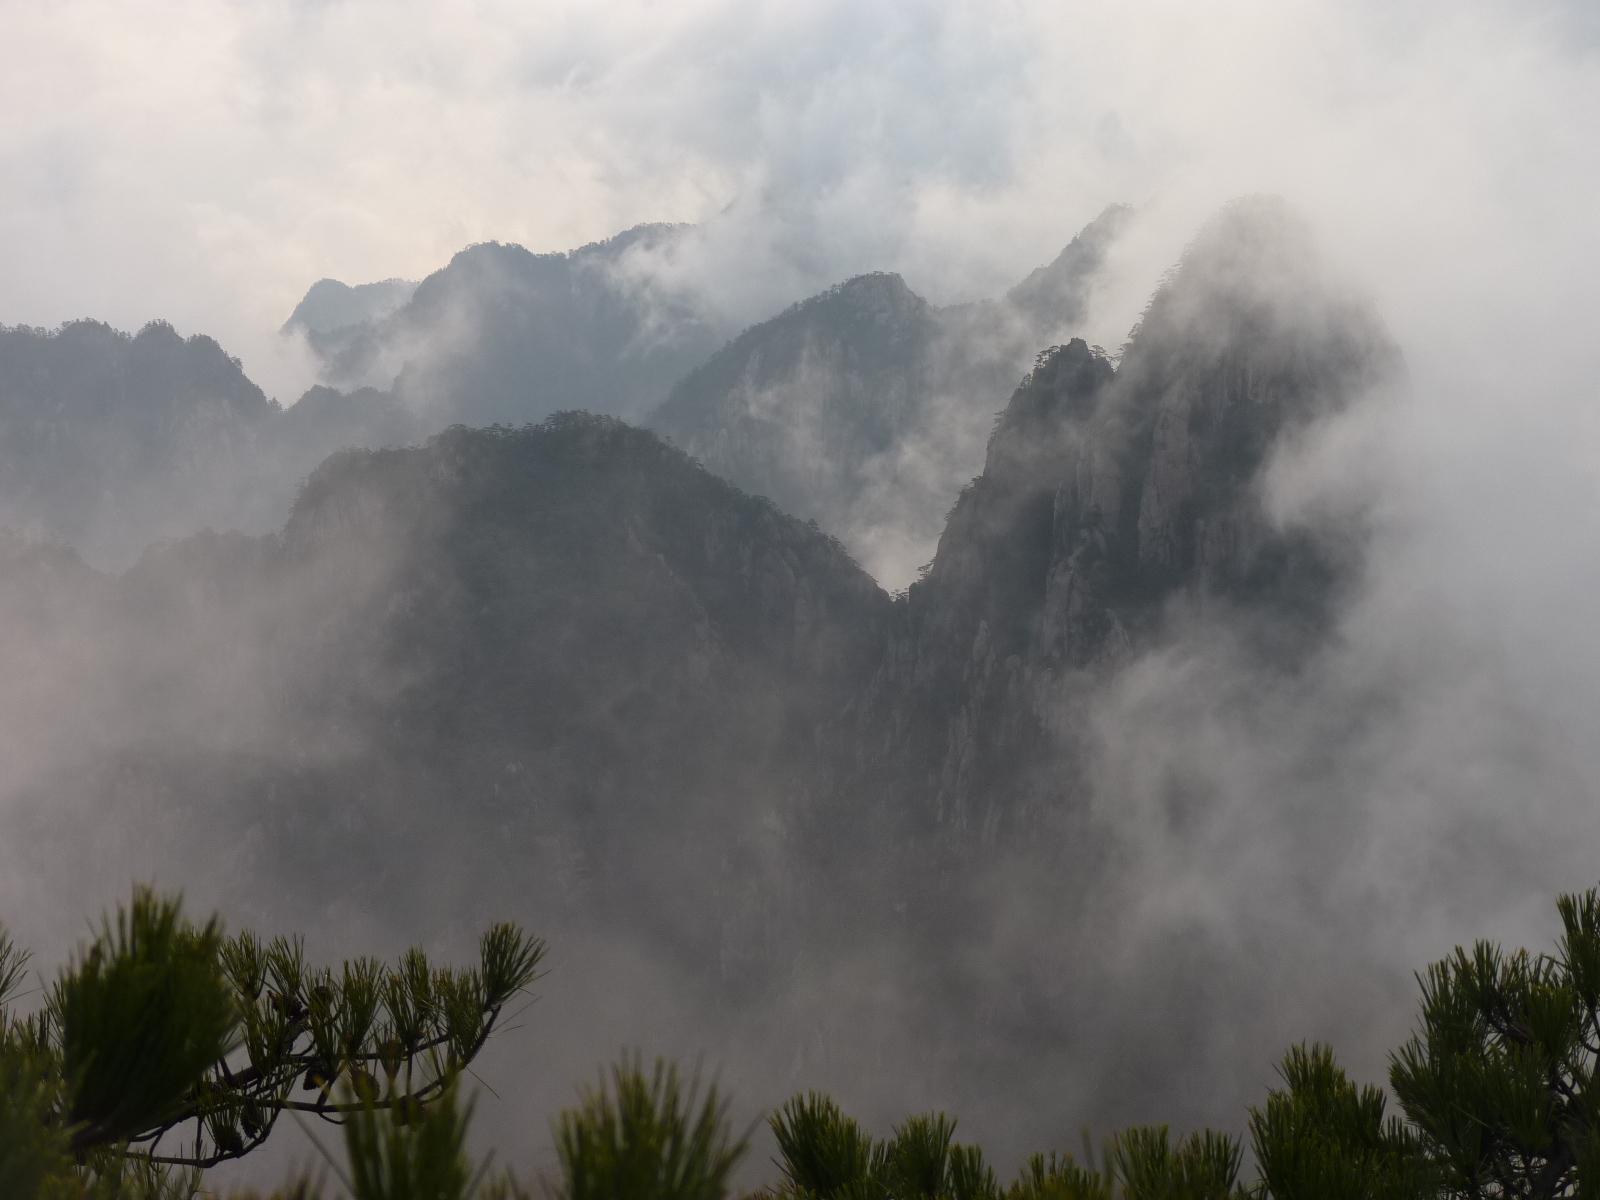 les montagnes Huang Shan